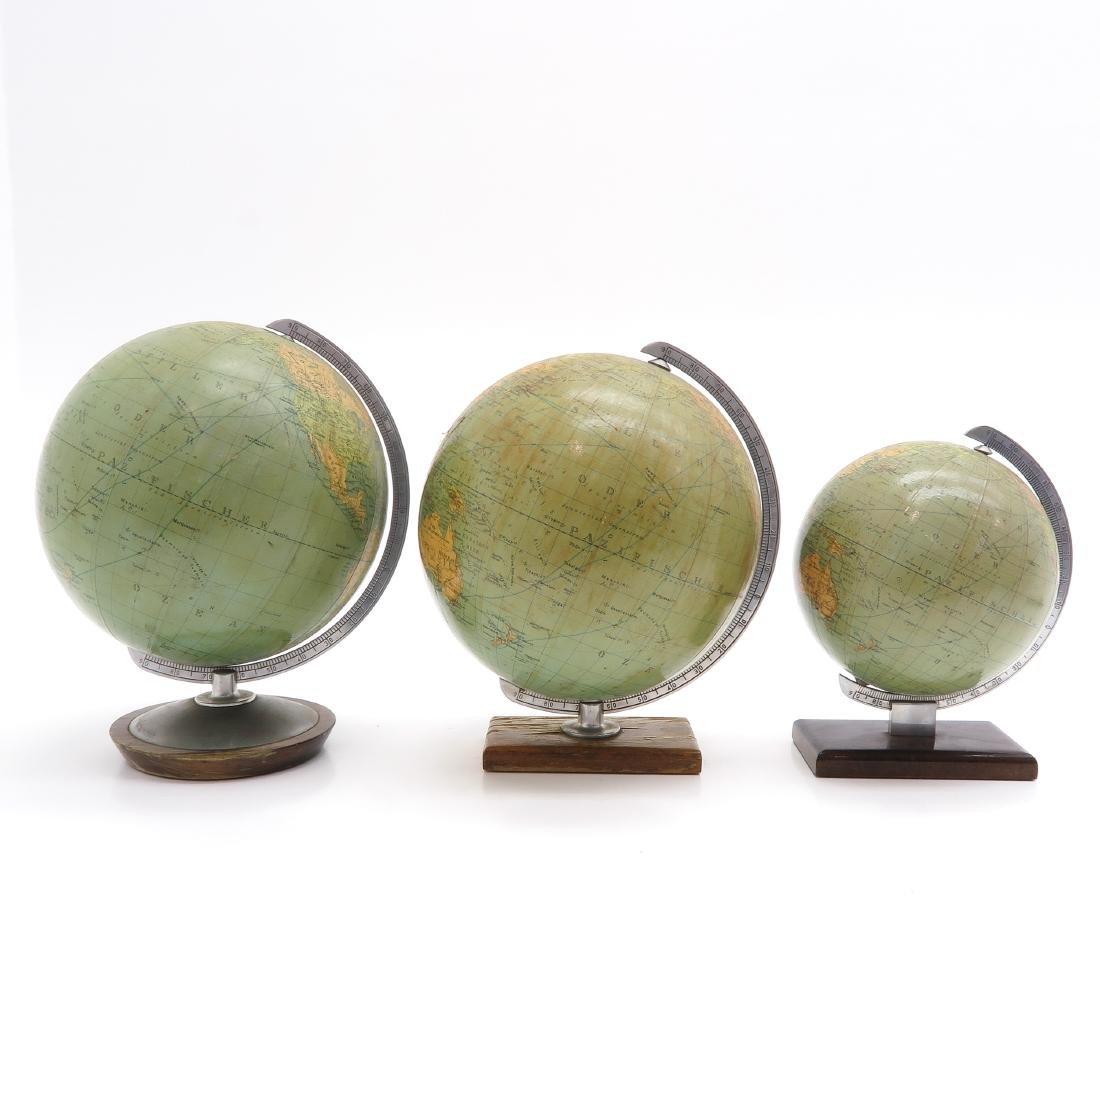 A Lot of 3 Columbus Erdglobus Globes - 2